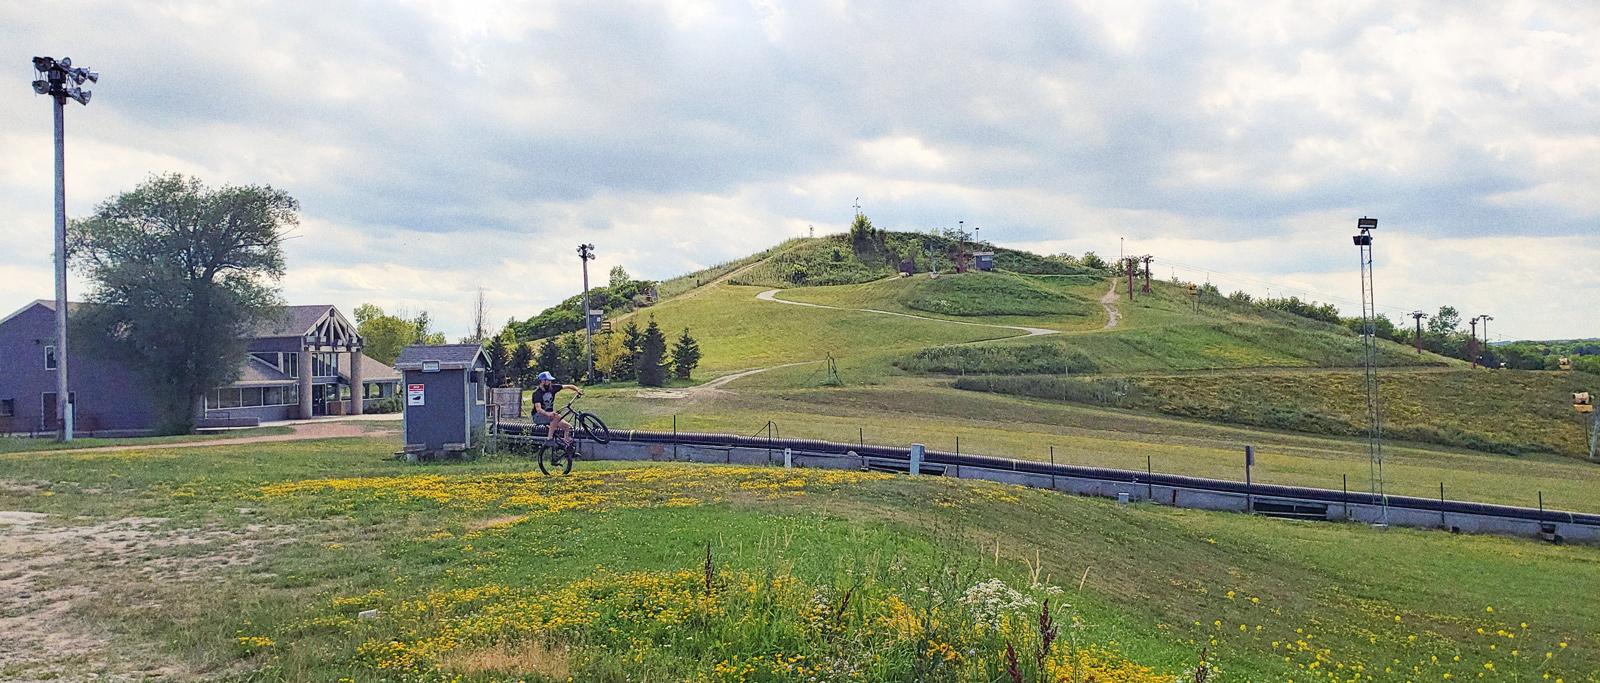 The ski hill at The Rock Sports Complex